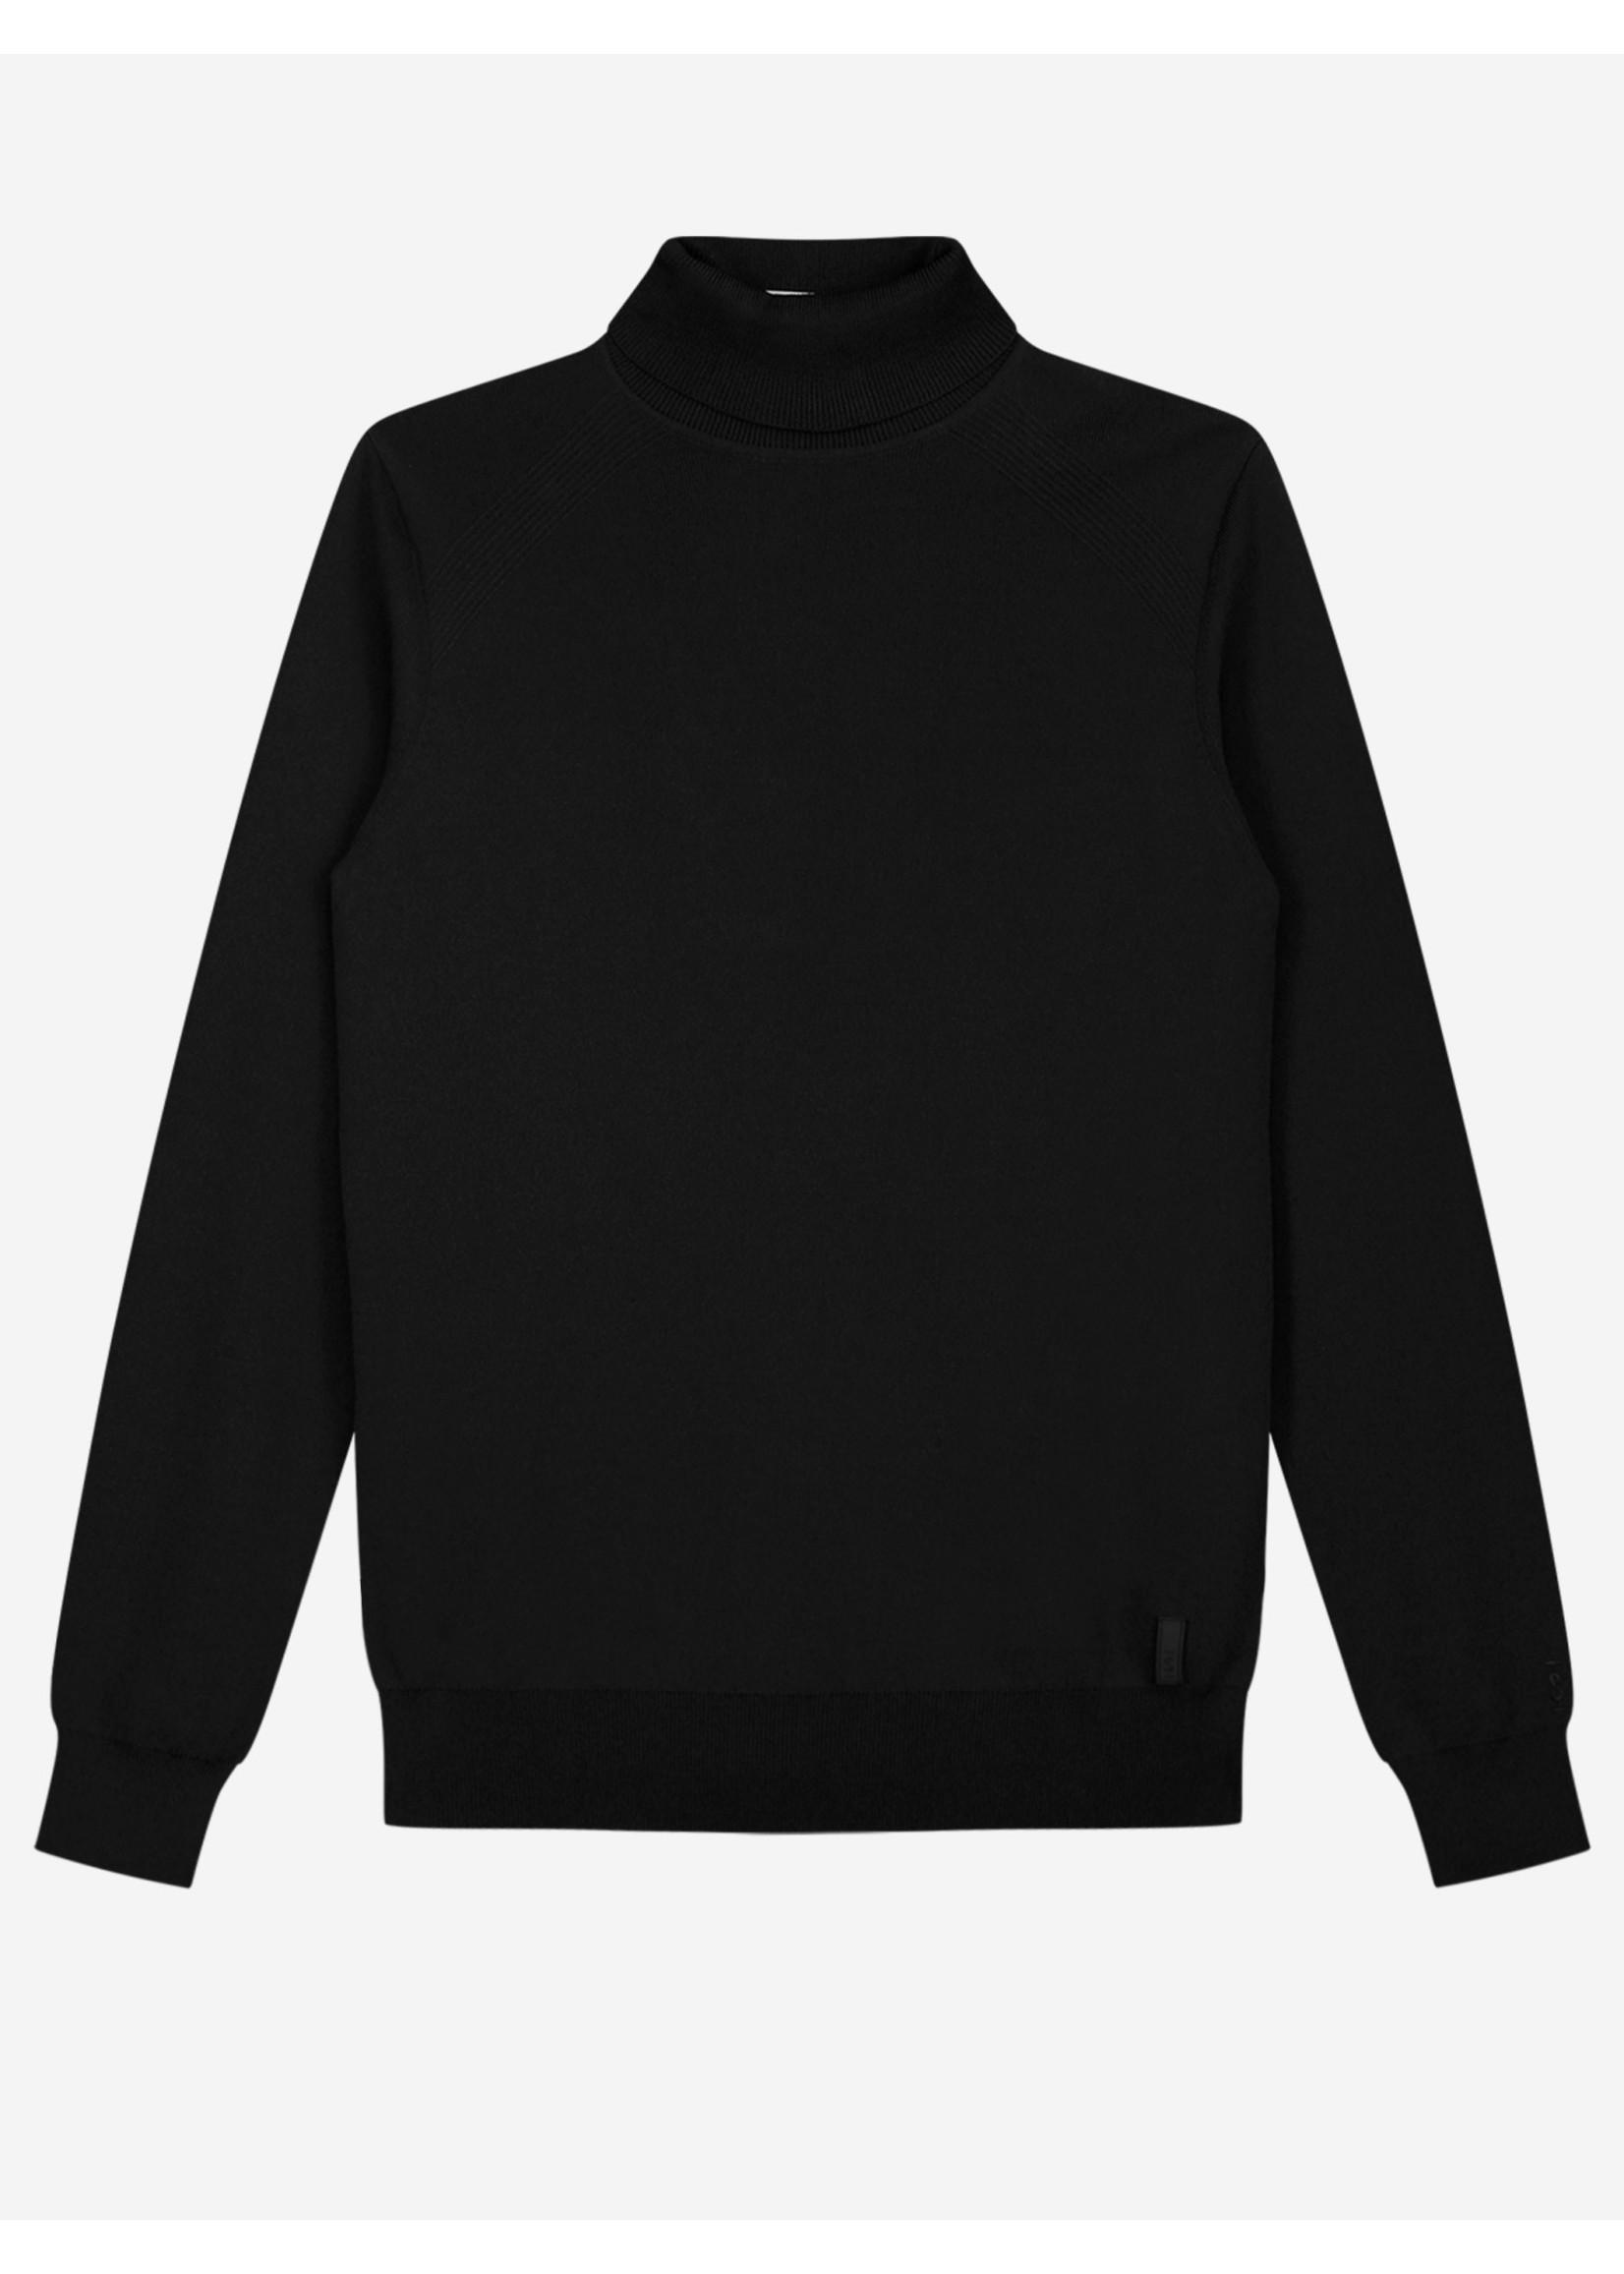 Sustain Sustain Knitted Turtleneck Sweater - Black